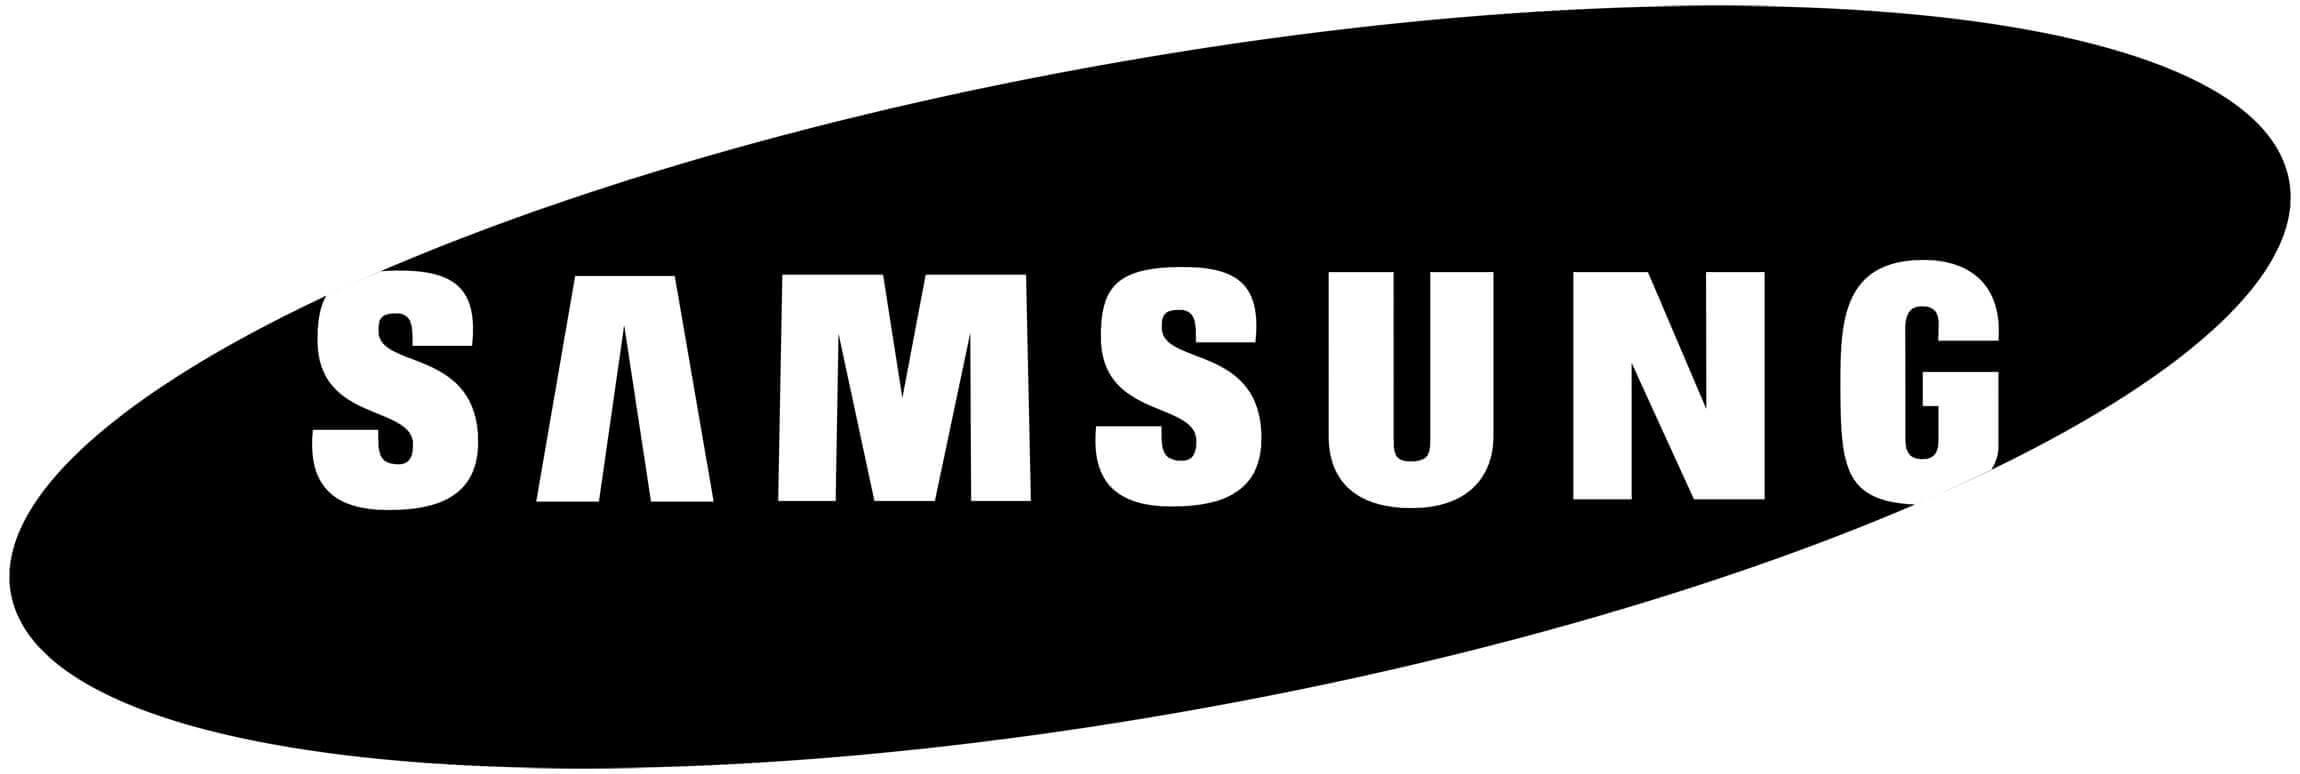 ssd samsung evo 970 250gb ssdbazar - SAMSUNG SSD 970 EVO 250GB اس اس دی سامسونگ